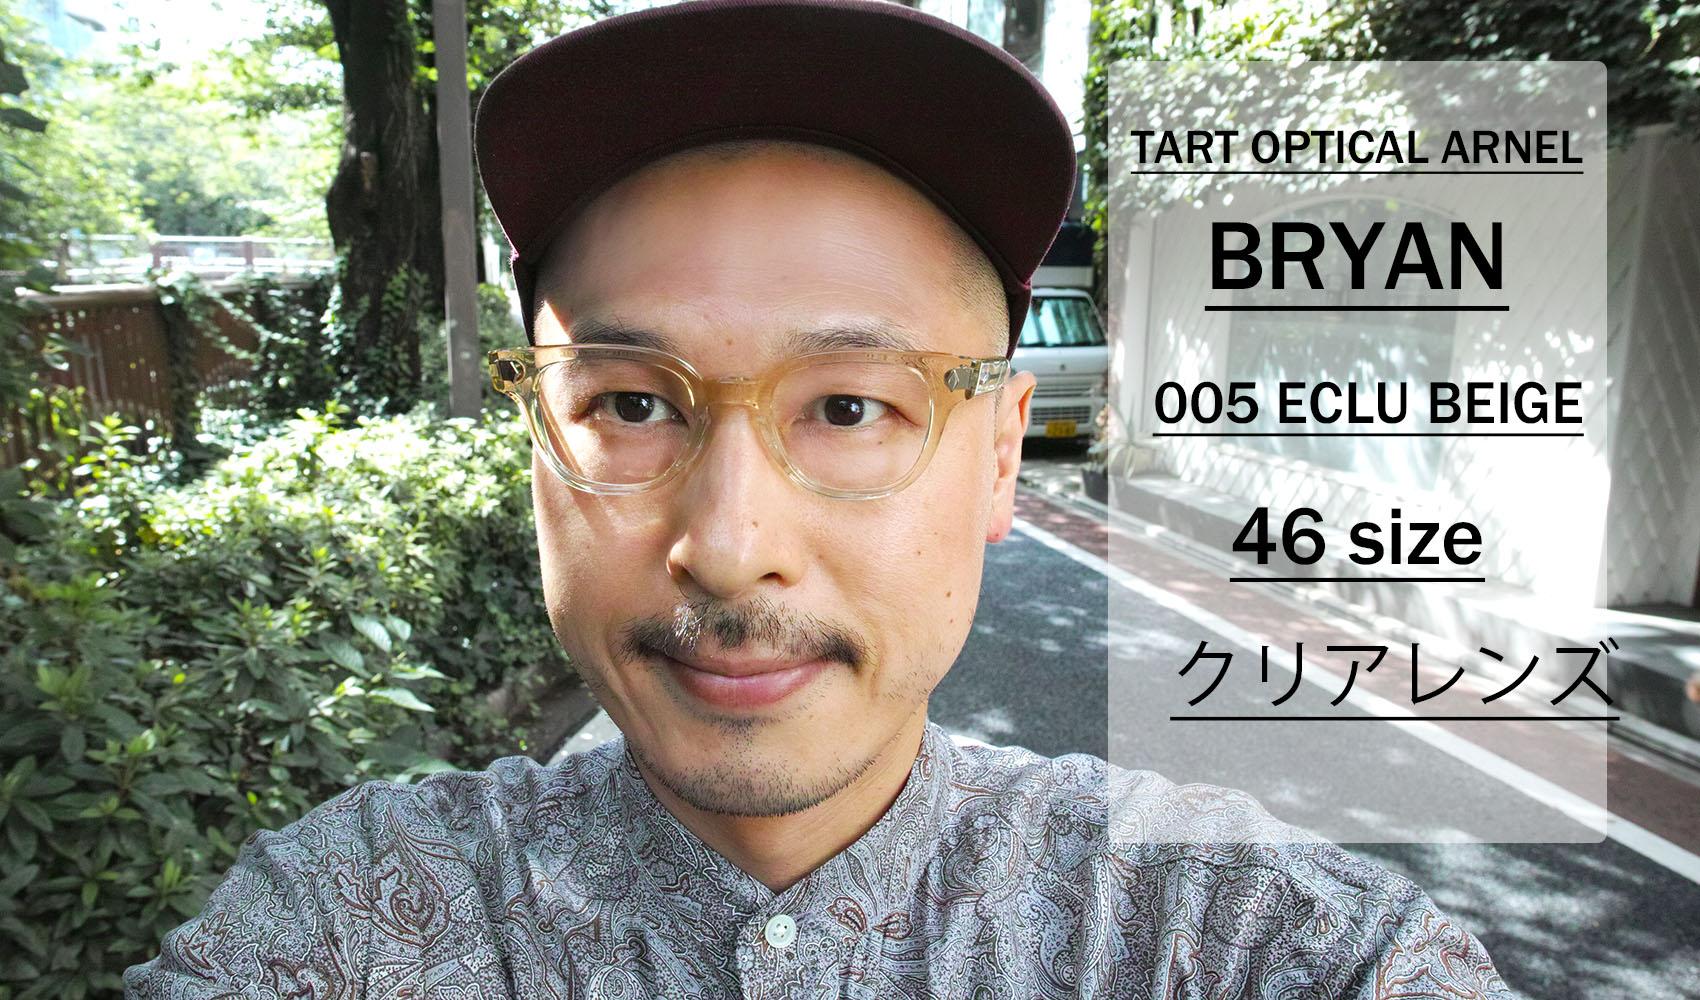 TART OPTICAL ARNEL / BRYAN / 005 ECRU BEIGE / 46 size